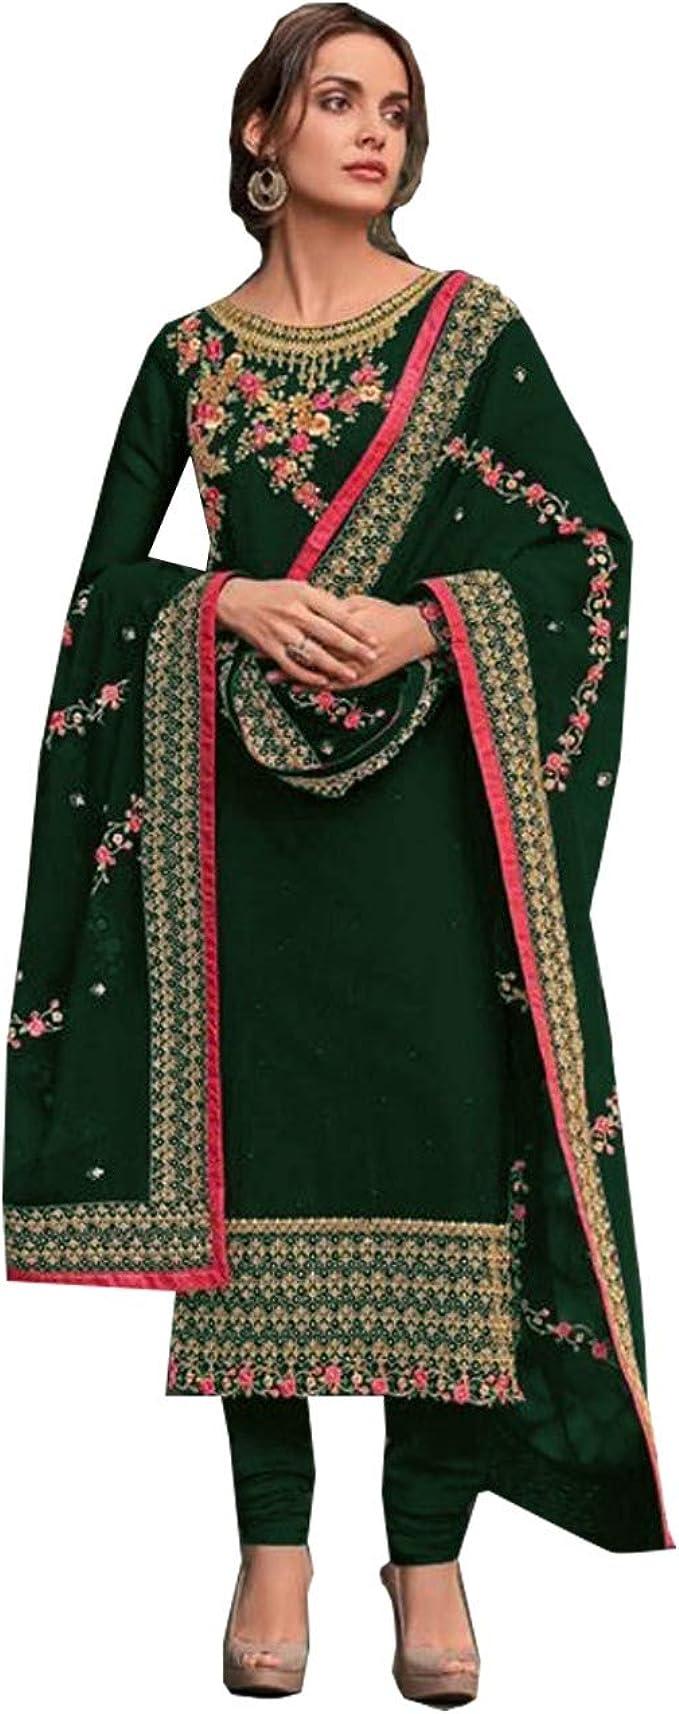 Valentine Special Women Dress Designer Indian Bridal Embroidery Stitch Work Suit